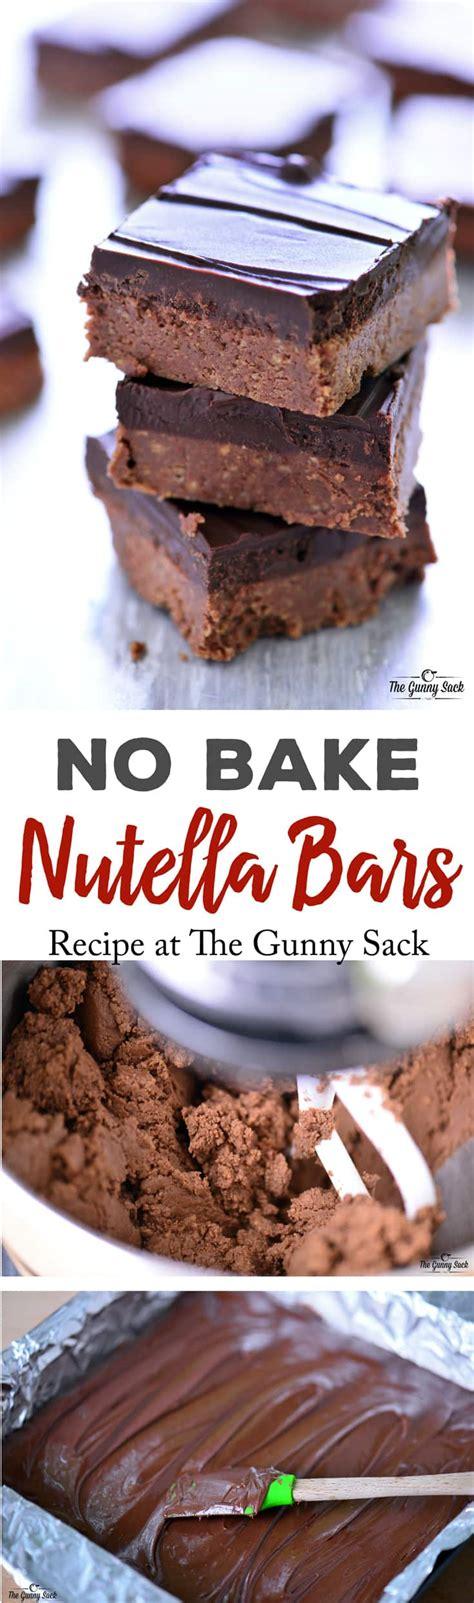 easy no bake recipes easy no bake nutella recipes